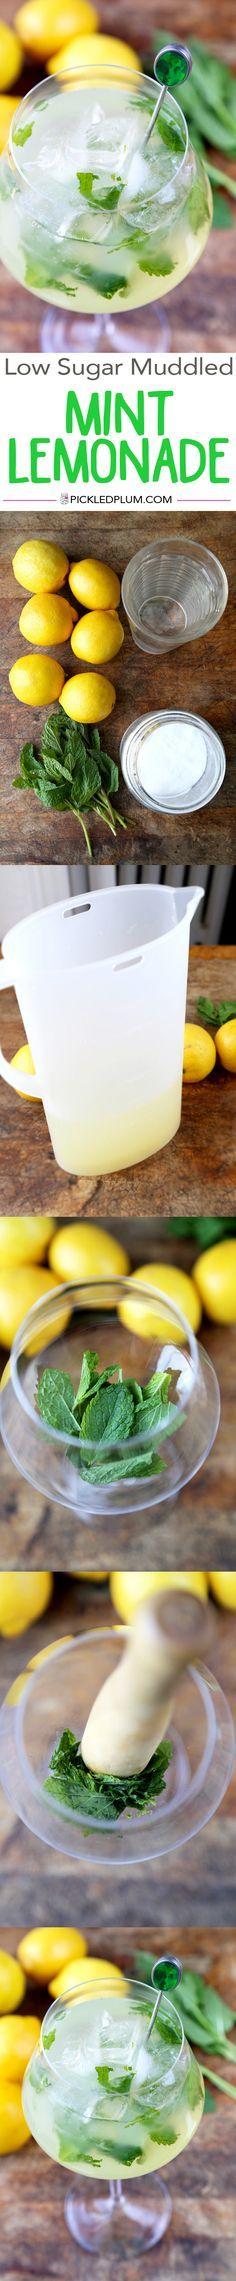 Low Sugar Mint Lemonade - Healthy, Tart and so Refreshing! http://www.pickledplum.com/mint-lemonade-recipe-low-sugar/